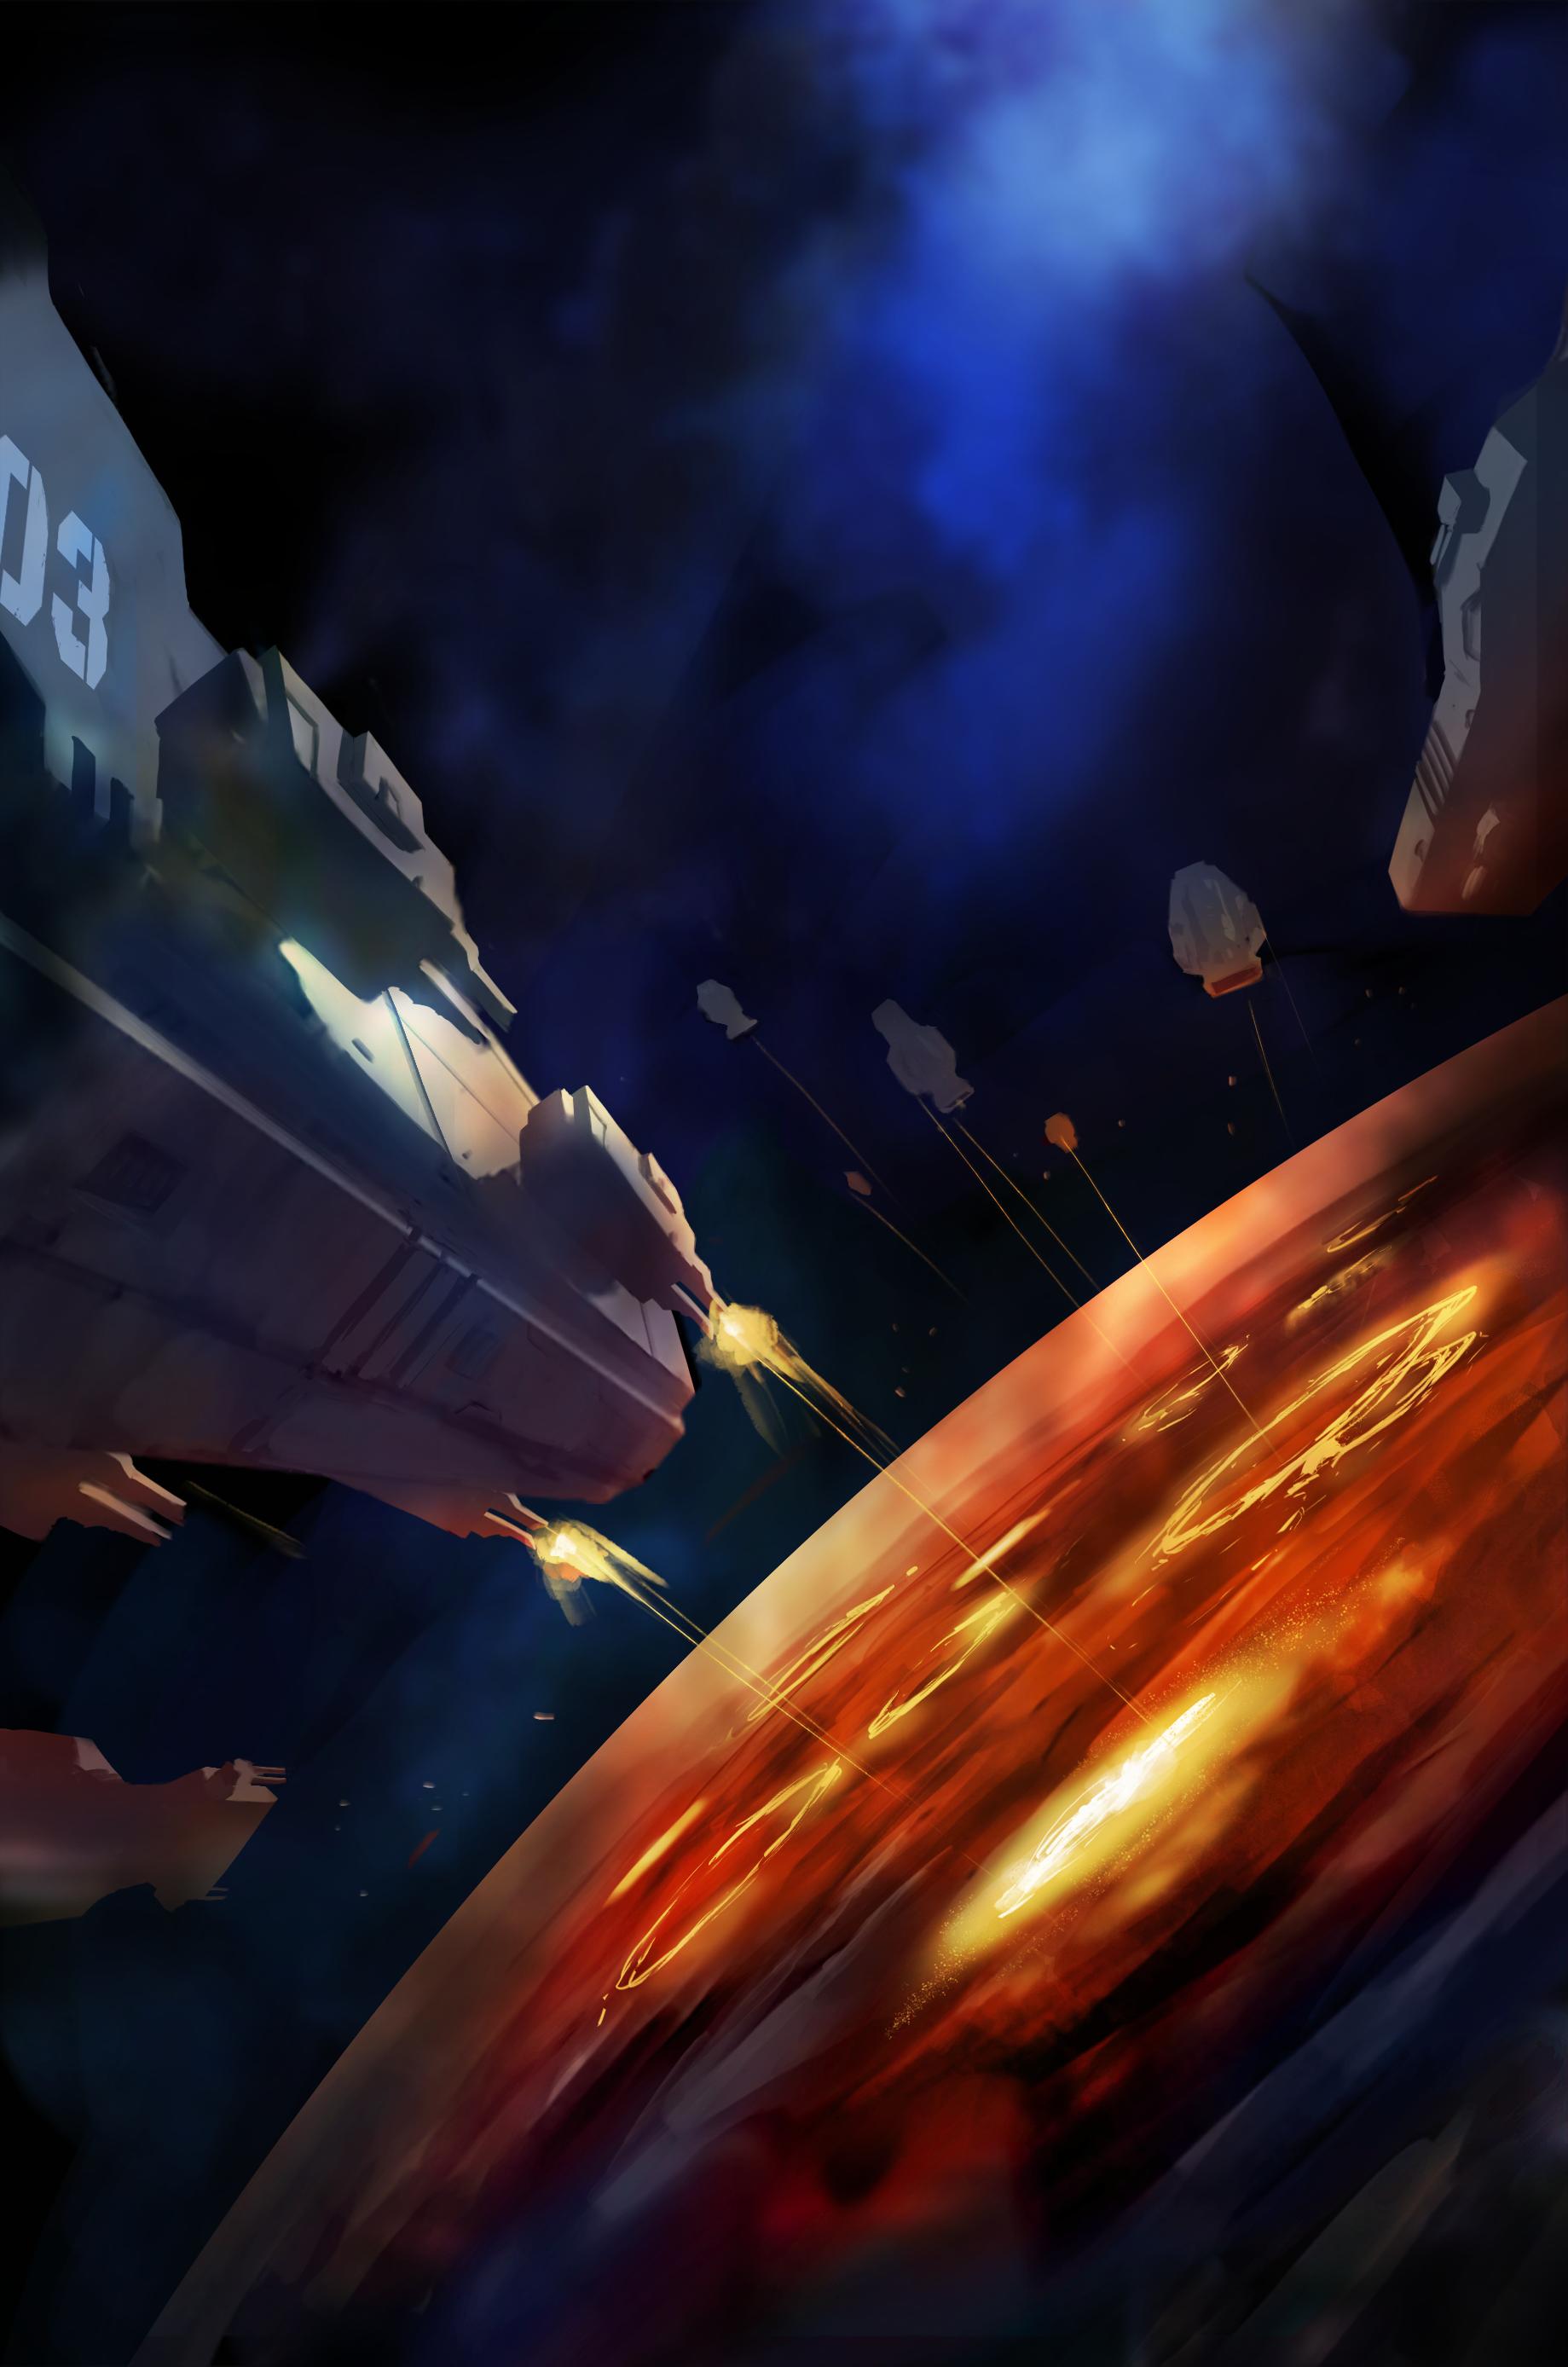 Earth Fleet Annihilation series (4 to 6 books)